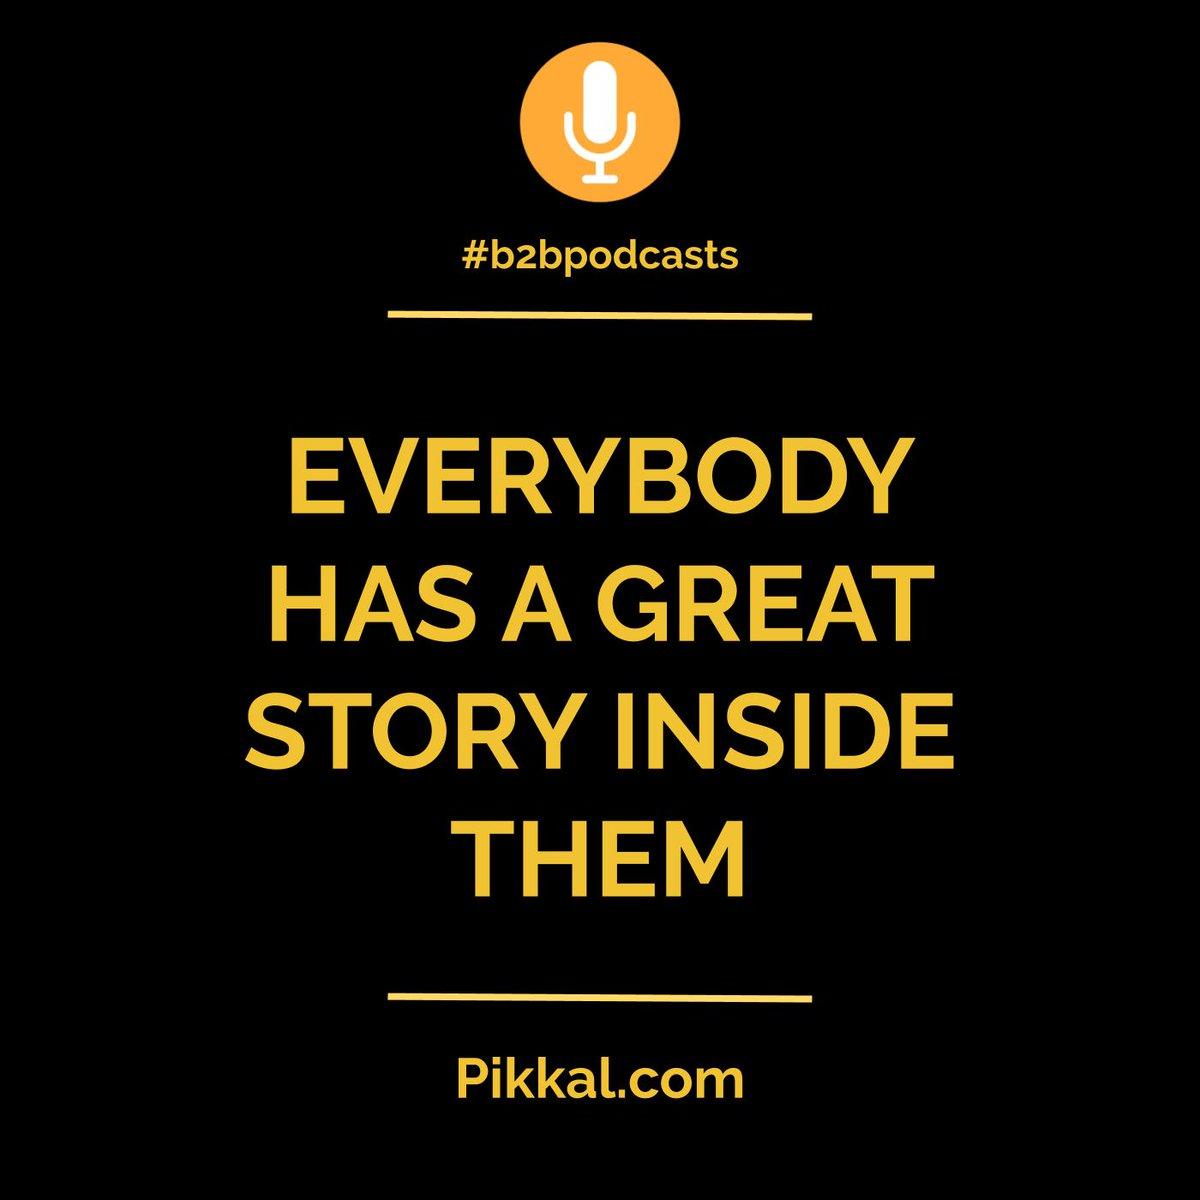 Monday Podcast Insight Jun 1, 2020 #b2bpodcasts #podcasting #leadership #storytellingpic.twitter.com/95PuFhVEjg